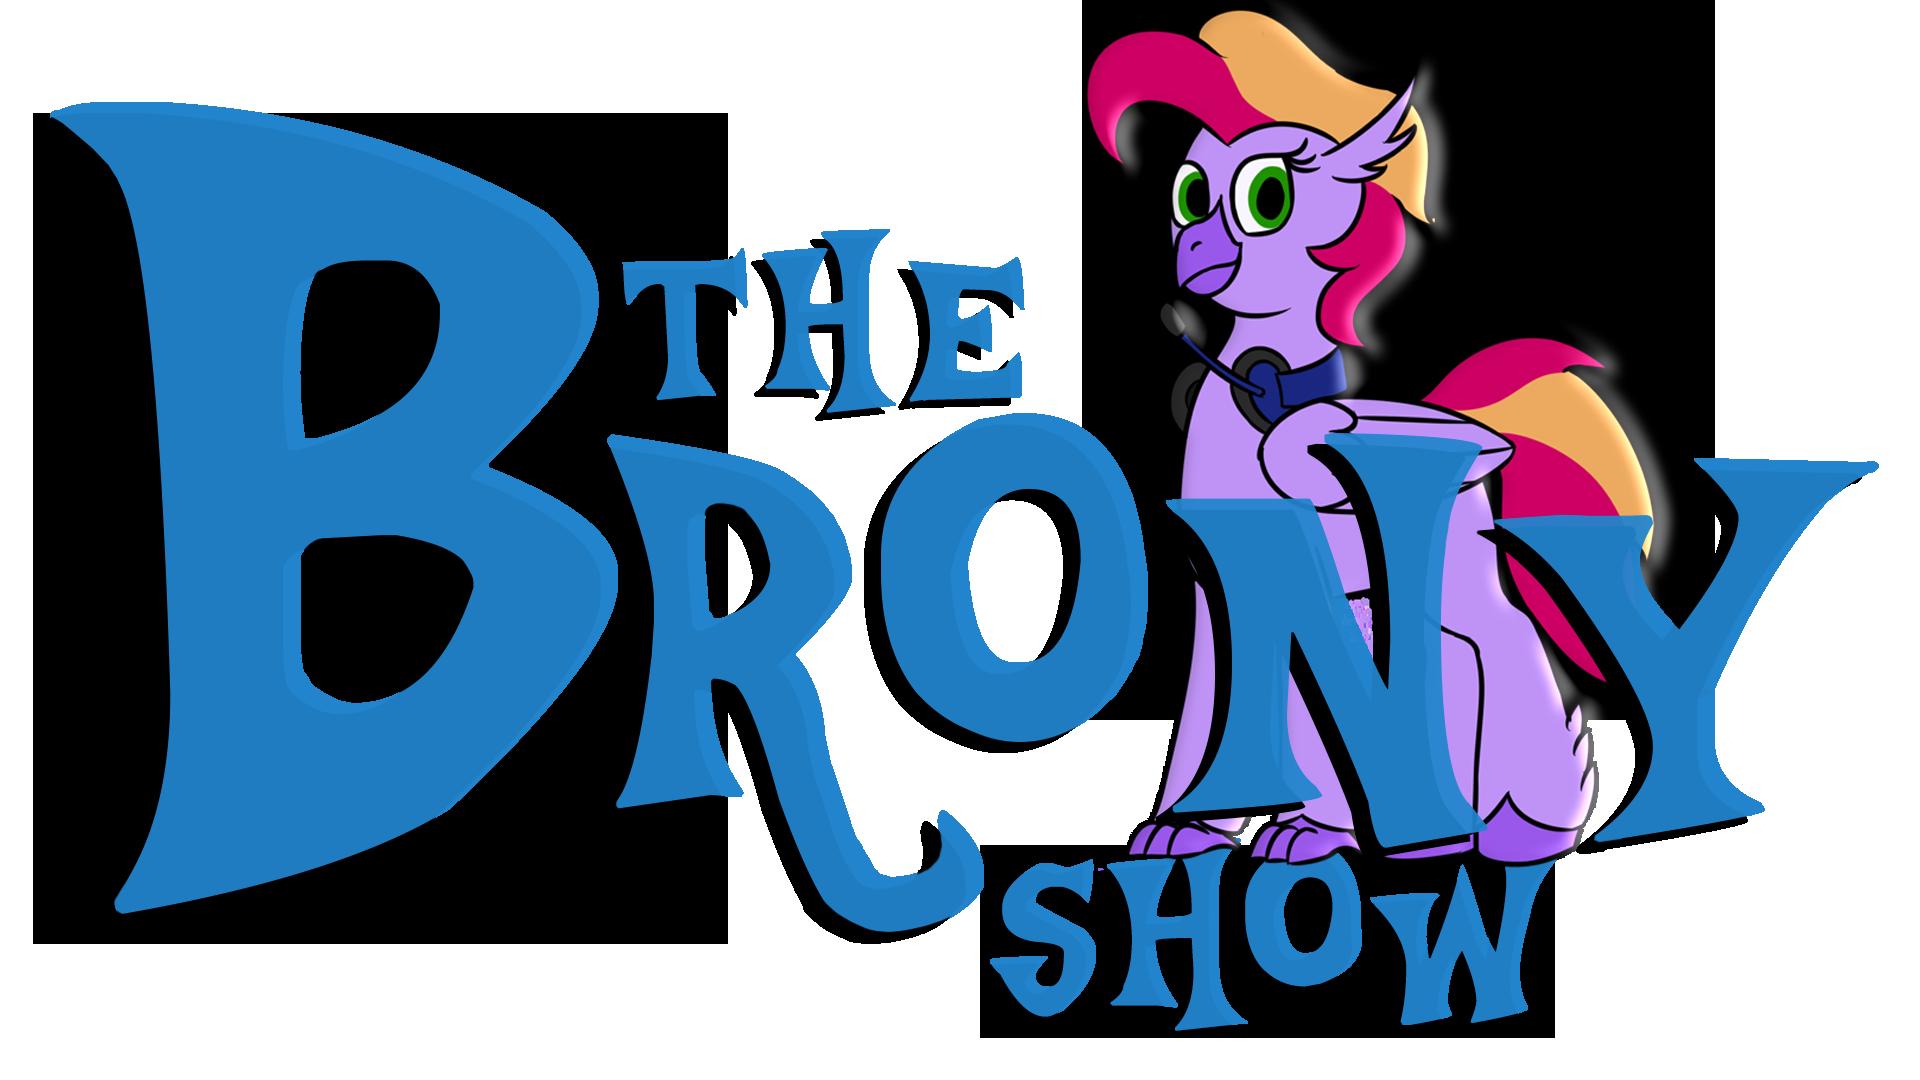 The Brony Show